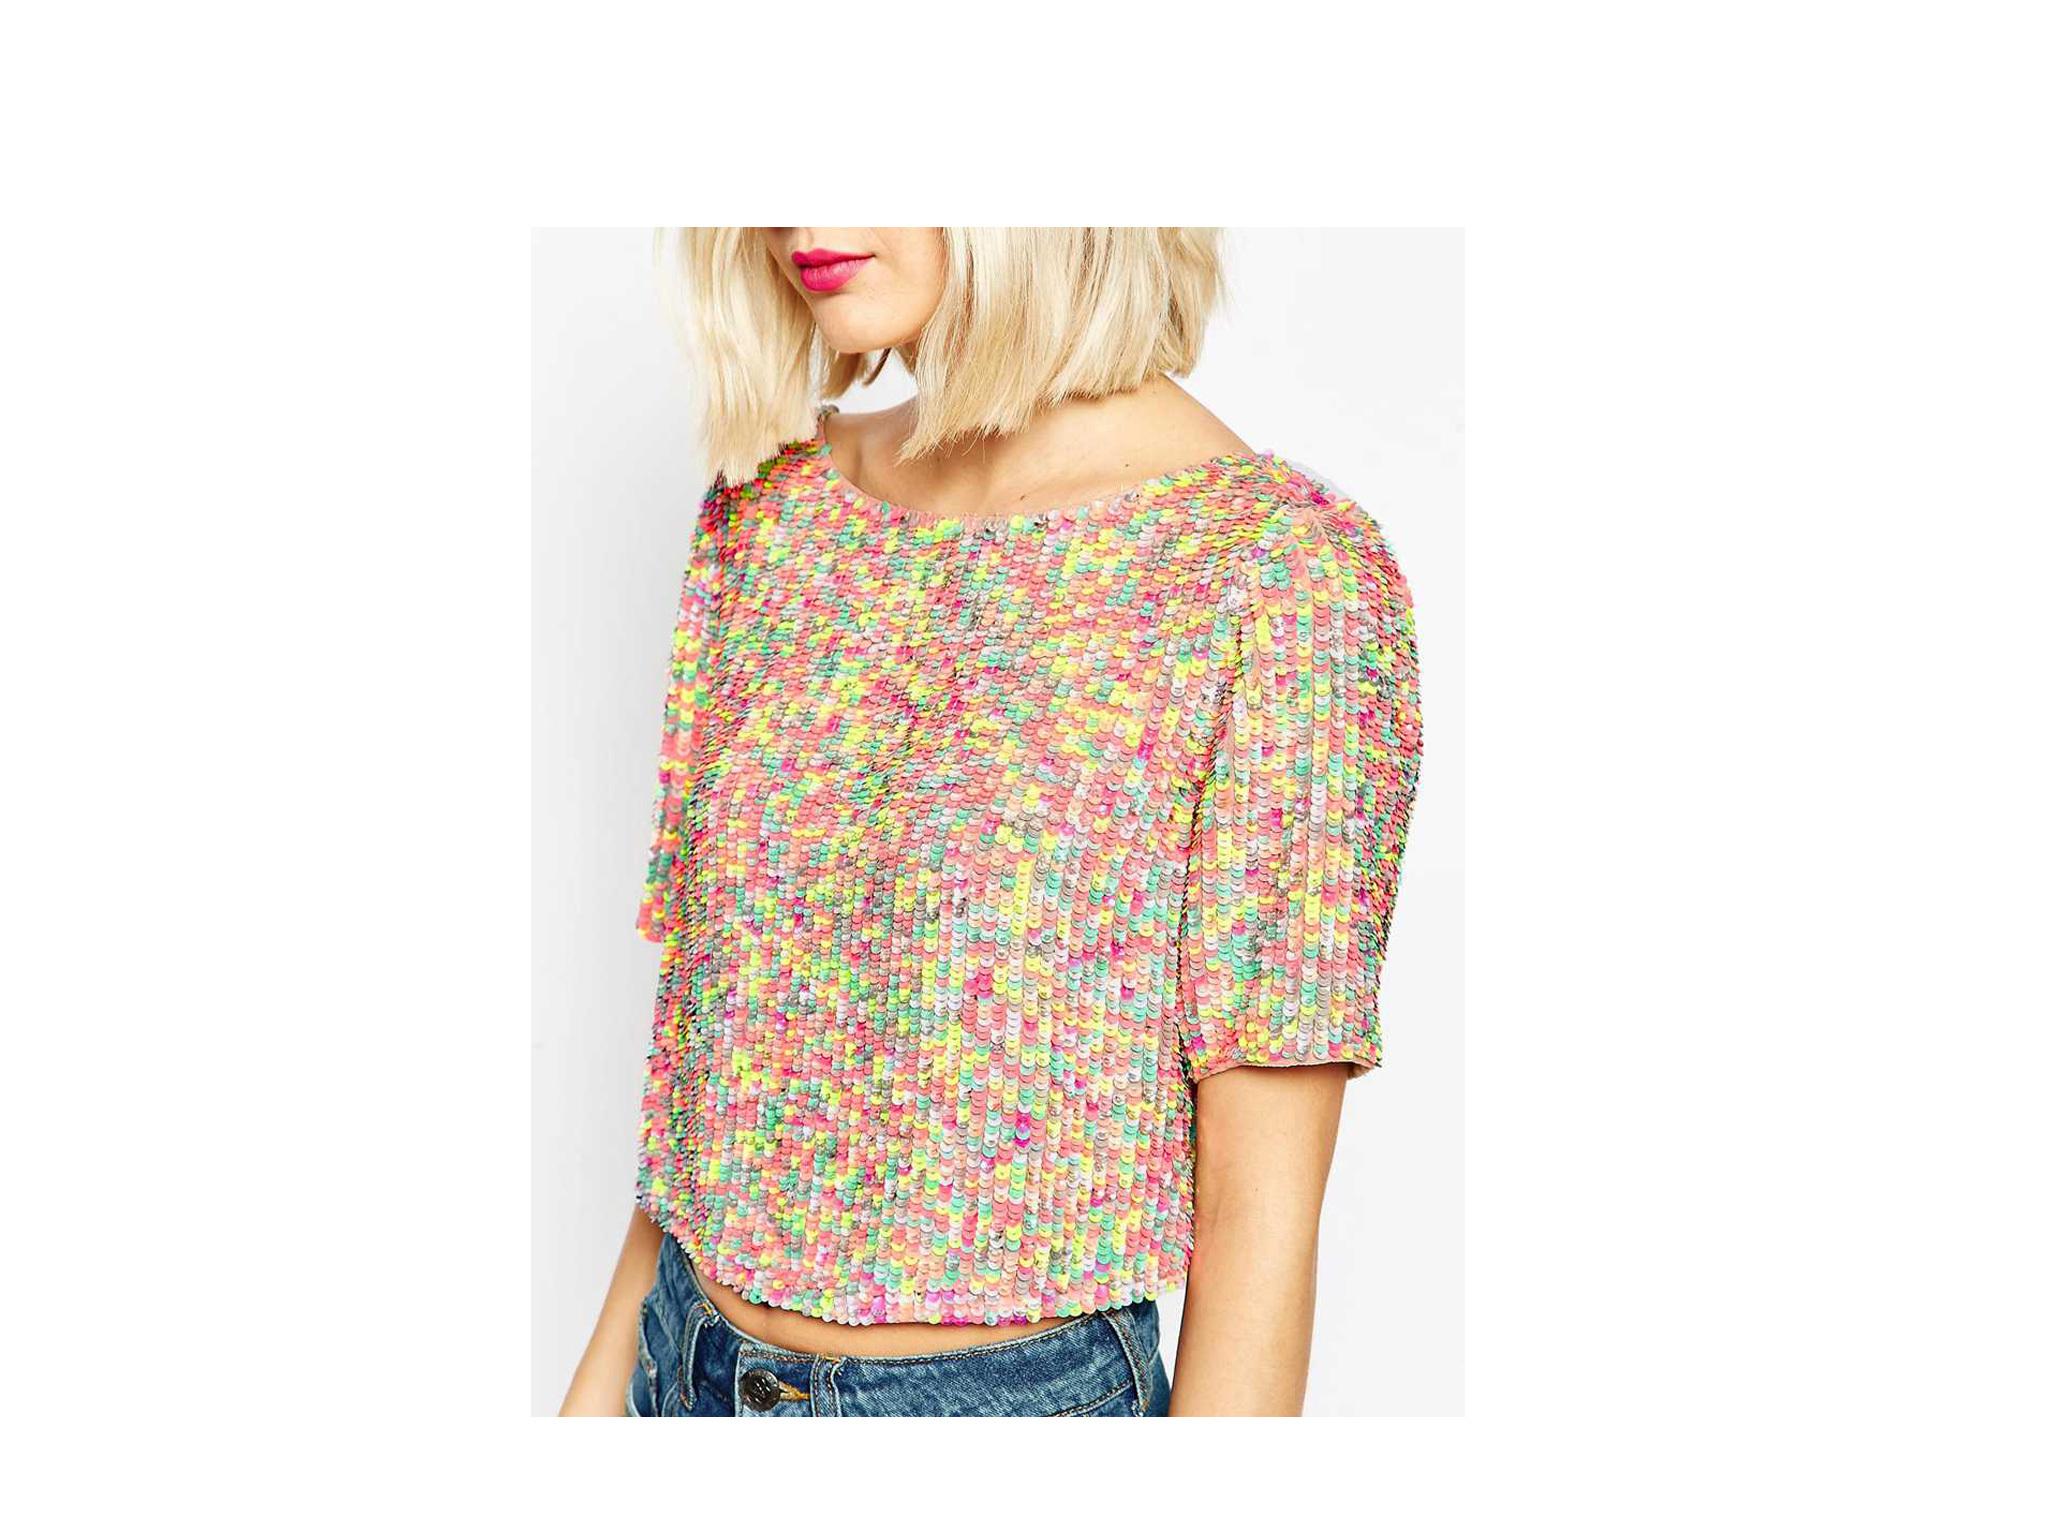 Sequin T-Shirt, £45, ASOS